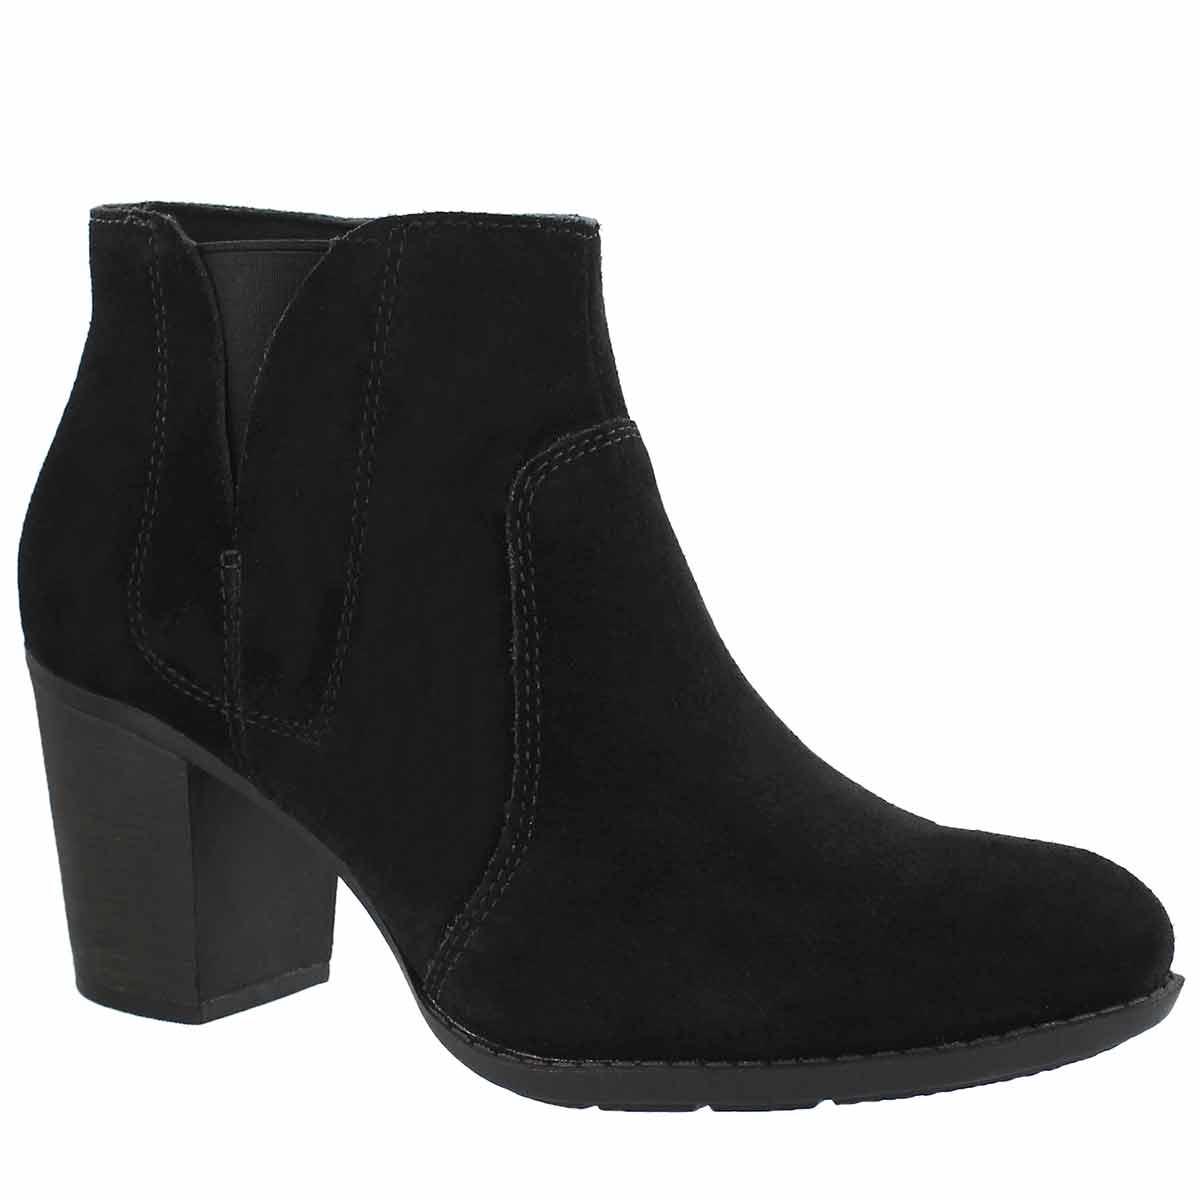 Women's ENFIELD SENYA black dress booties